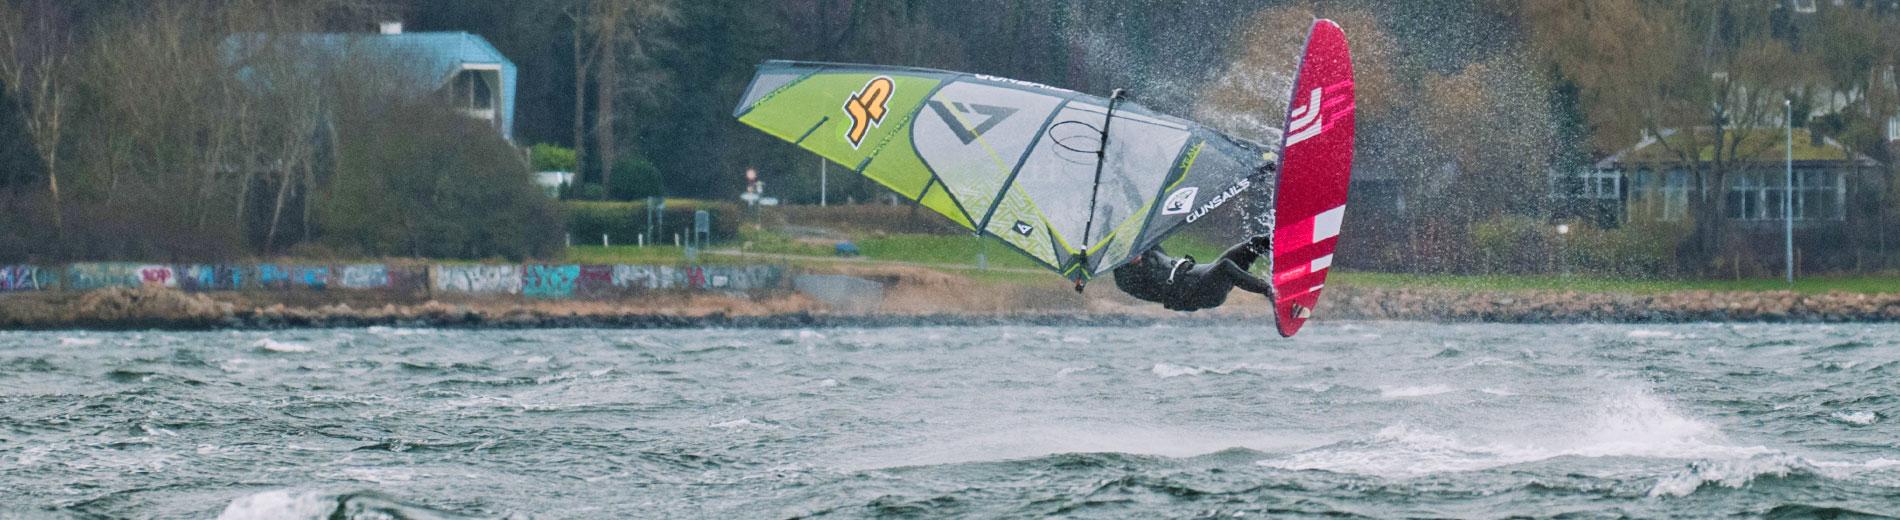 GUNSAILS | Lucas Nebelung - PWA Worldtour Rider, EFPT Freestyle Tour Windsurfing, German Freestyle Battles